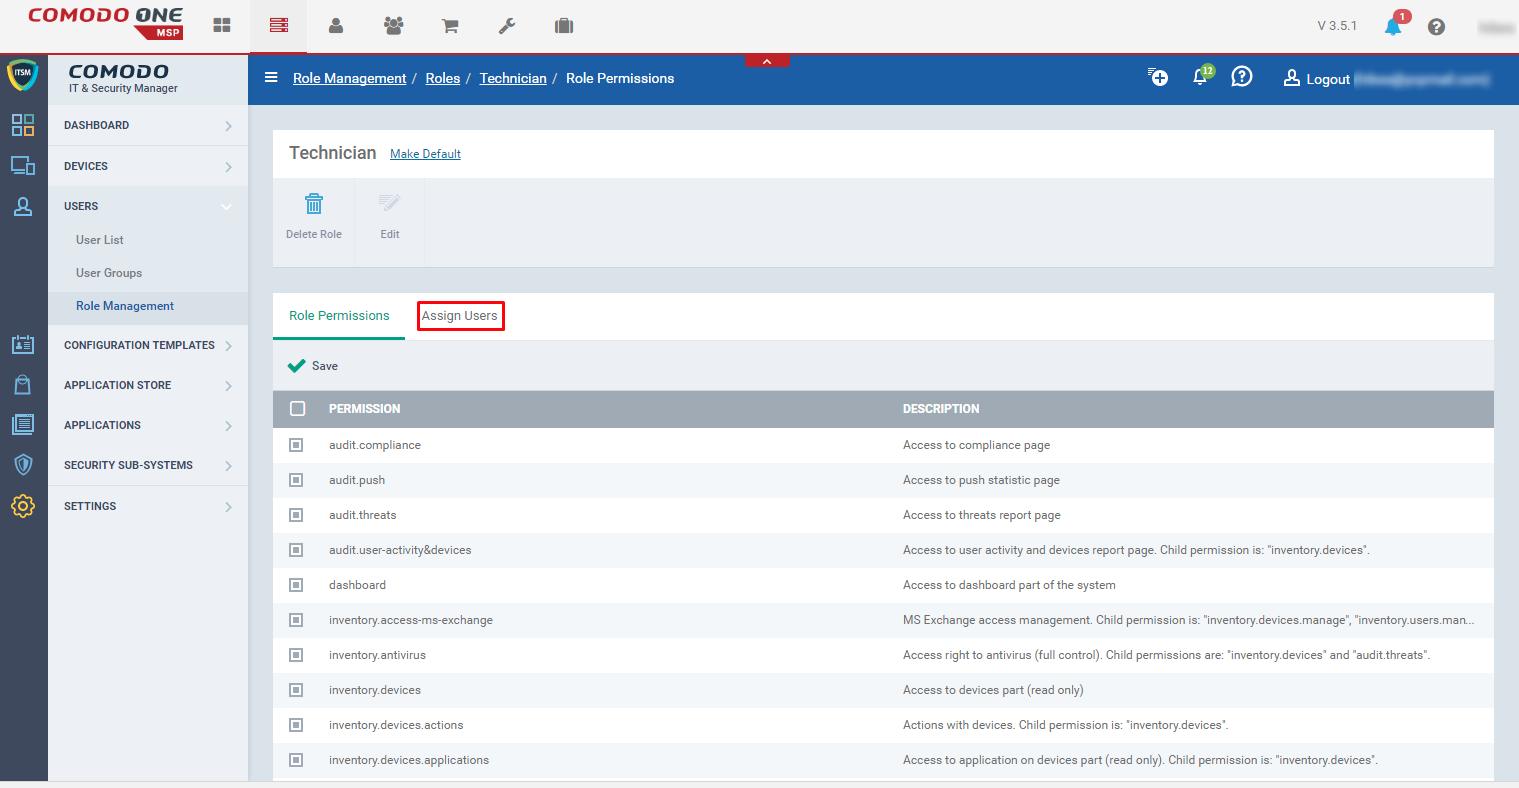 Comodo One | Configuring roles in ITSM